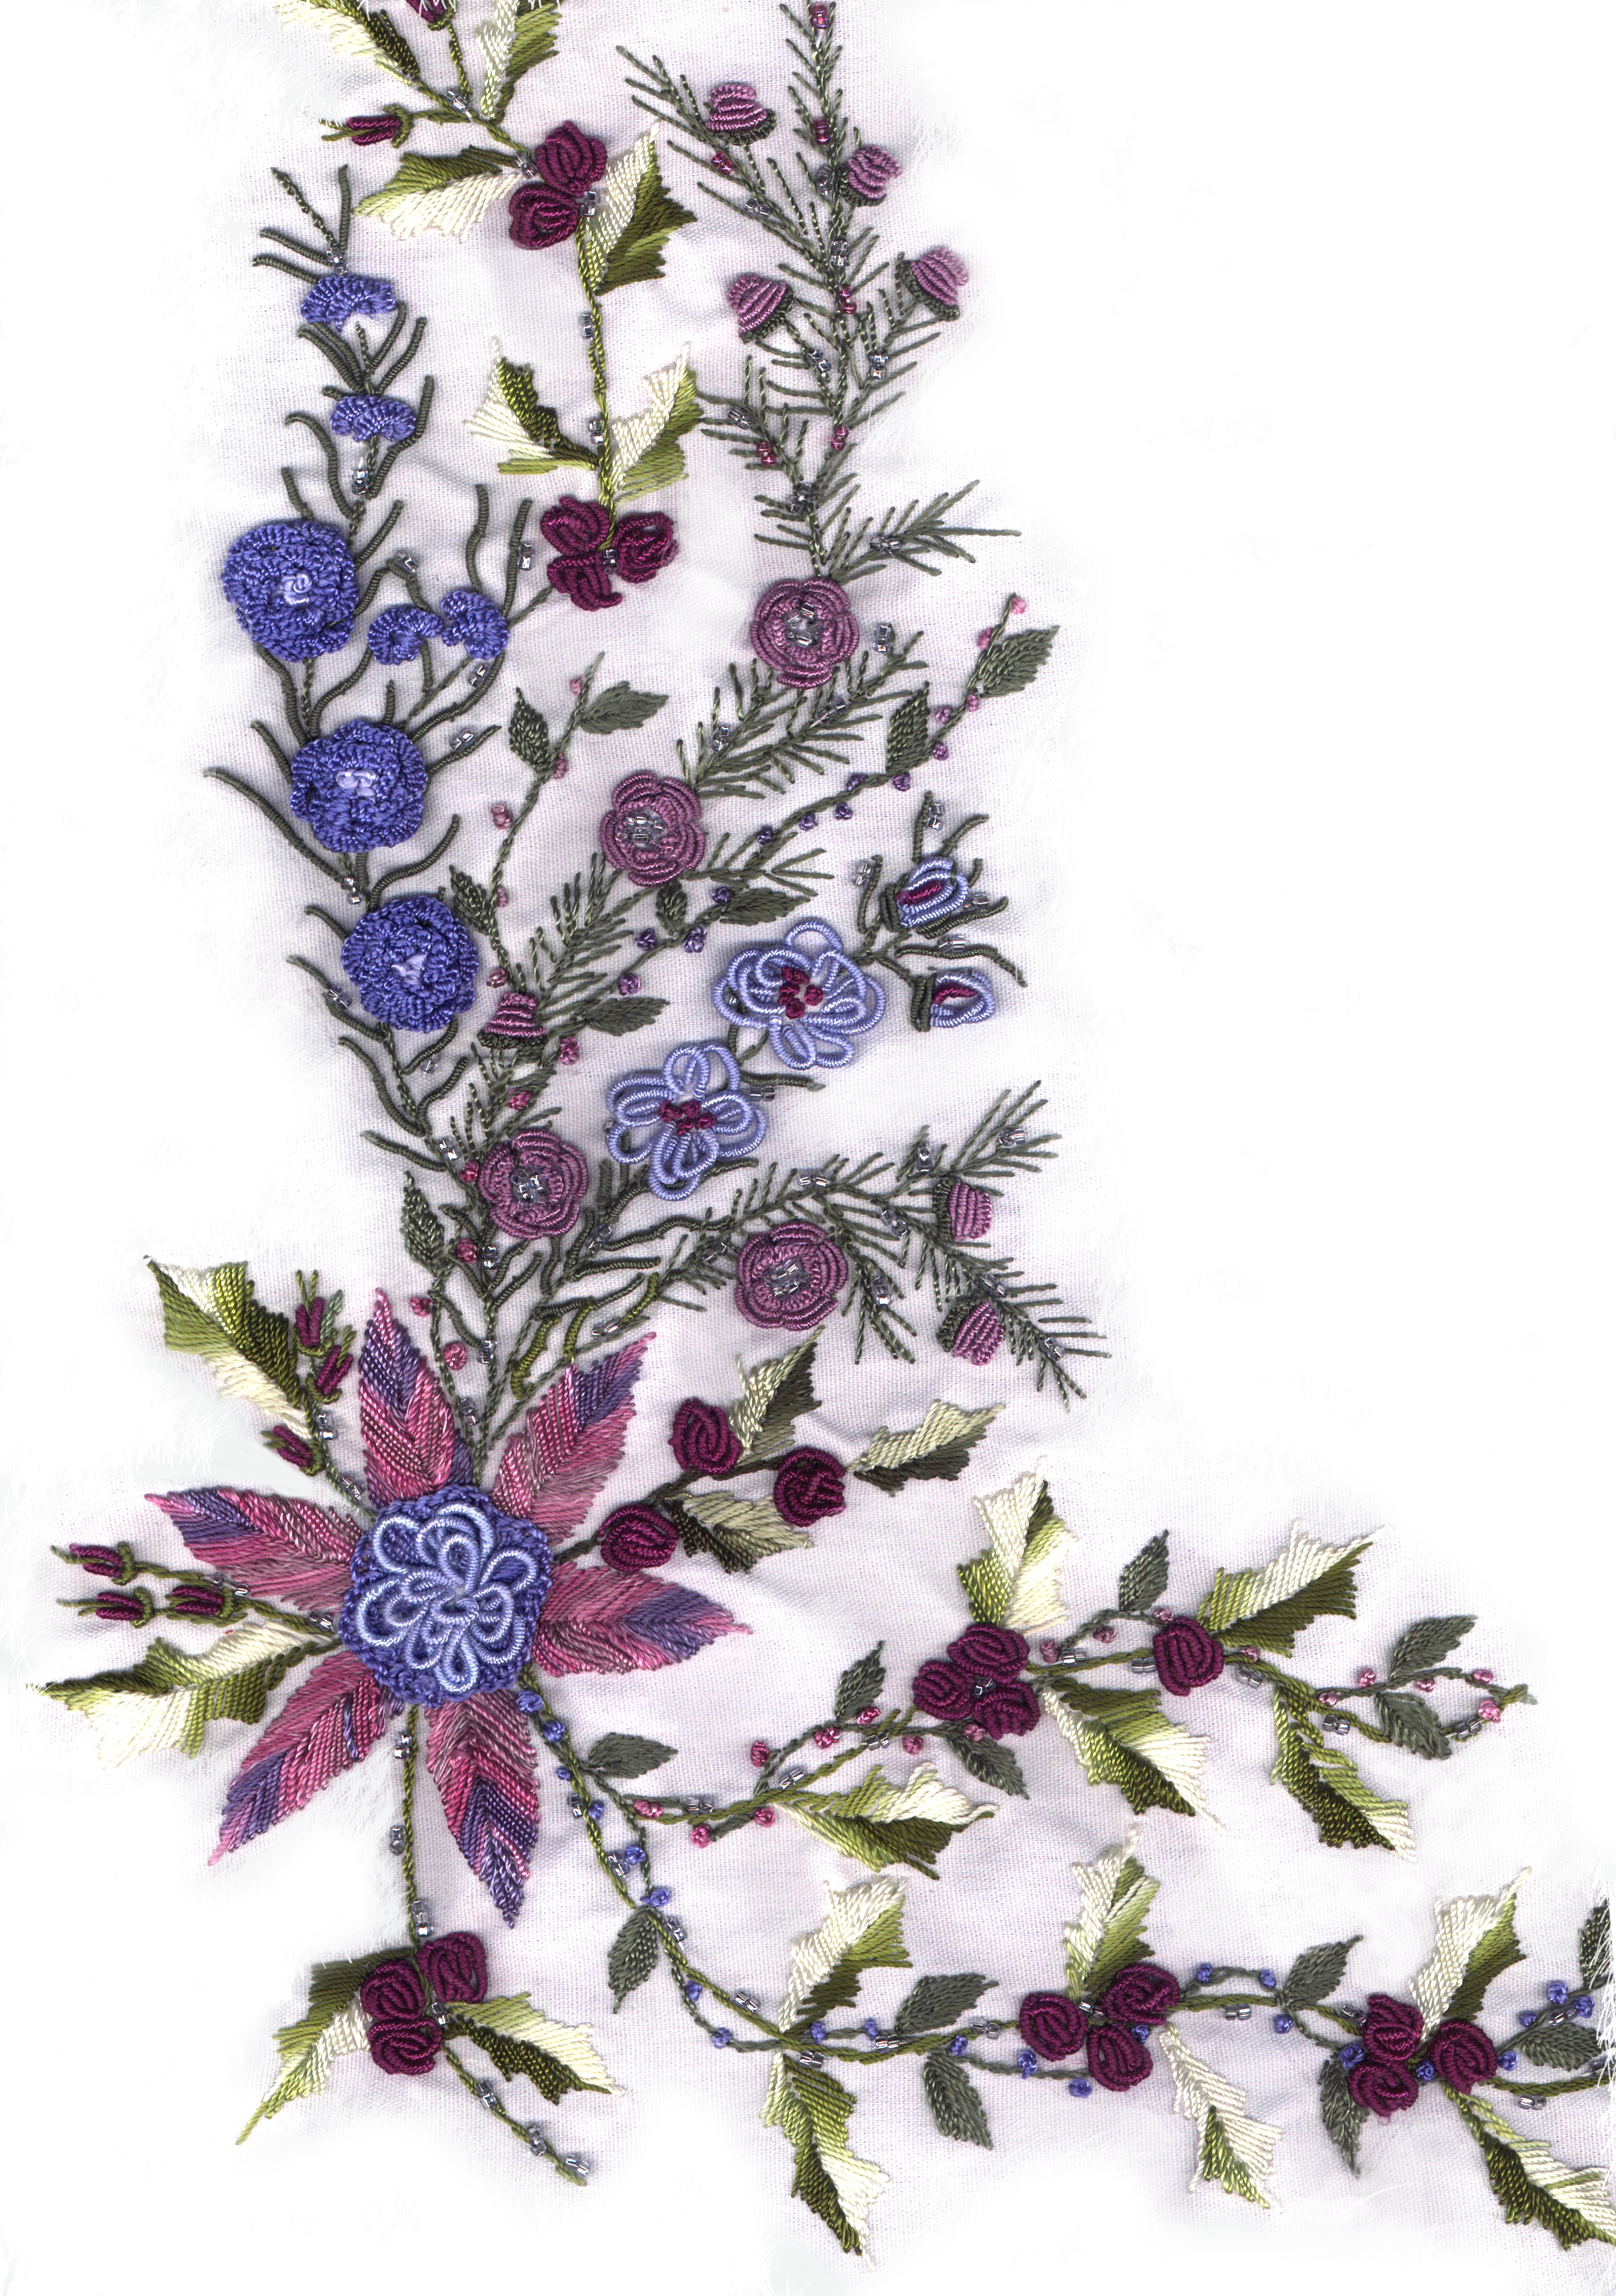 Brazilian Embroidery Christmas Patterns Jdr 6047